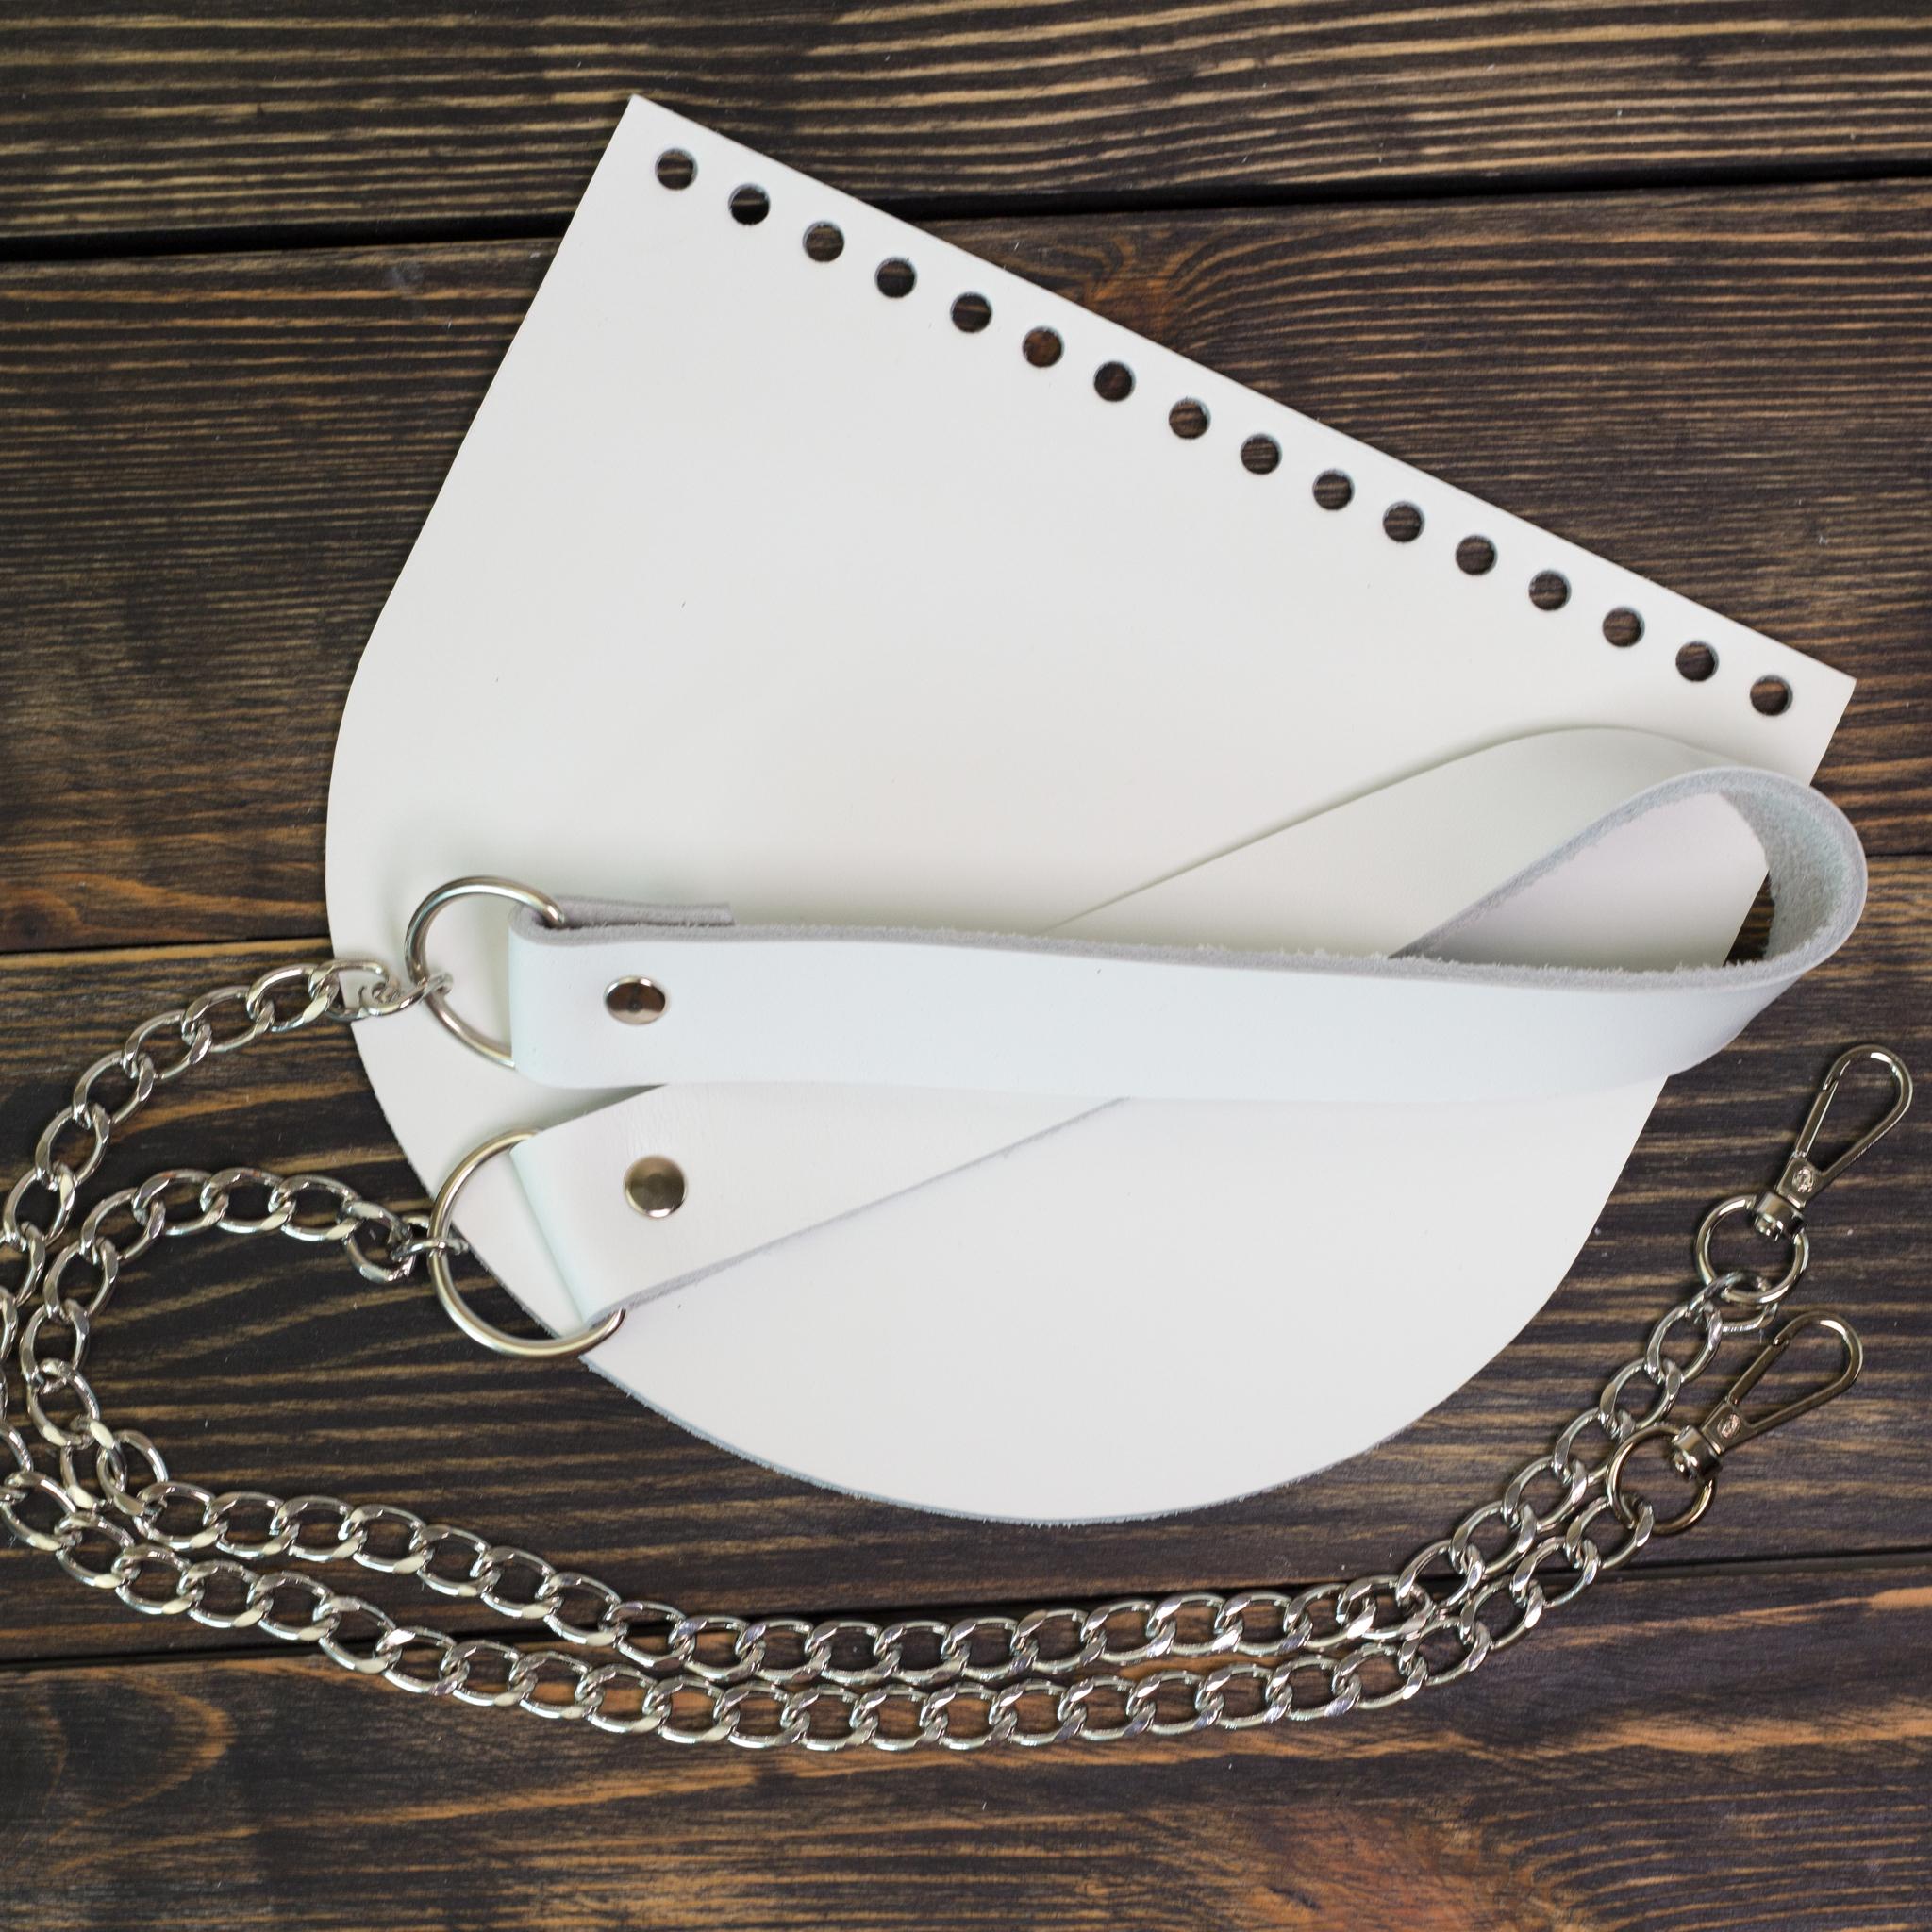 Каталог Комплект для сумки белый IMG_9804.jpg